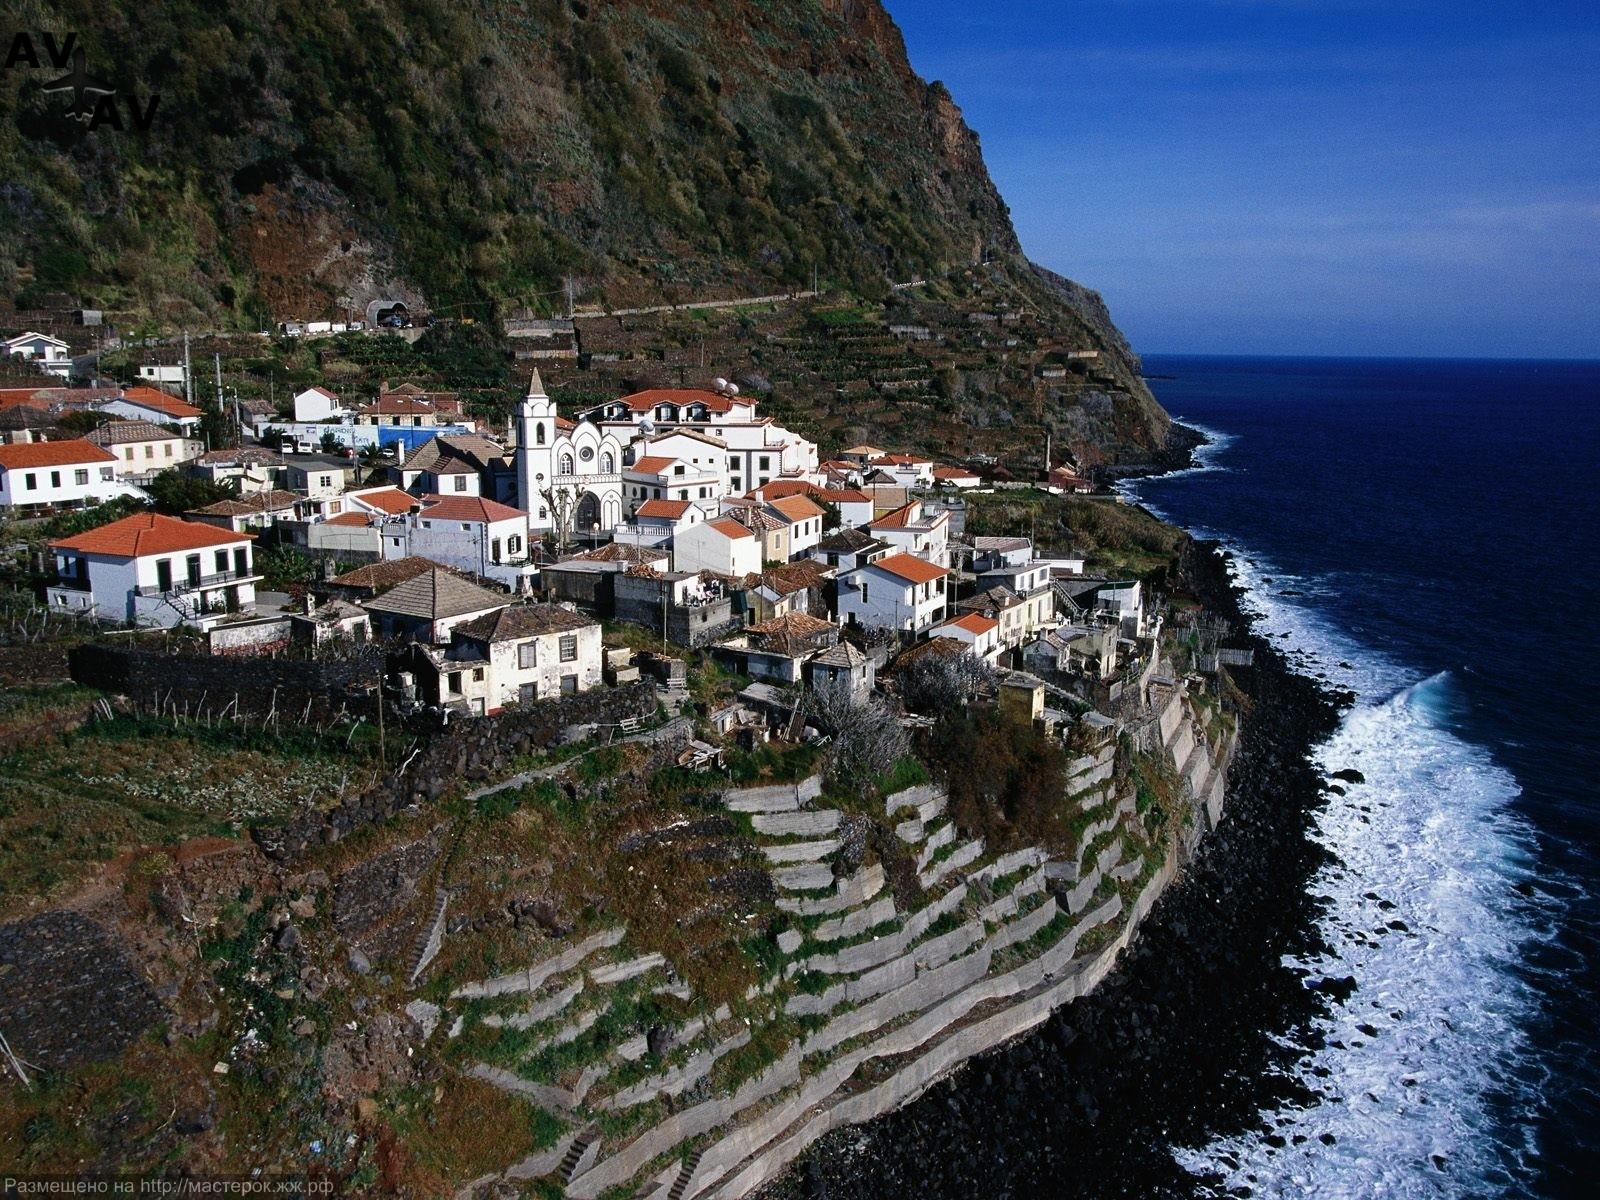 Madeyra velikolepnyiy atlanticheskiy kurort - Мадейра - великолепный атлантический курорт